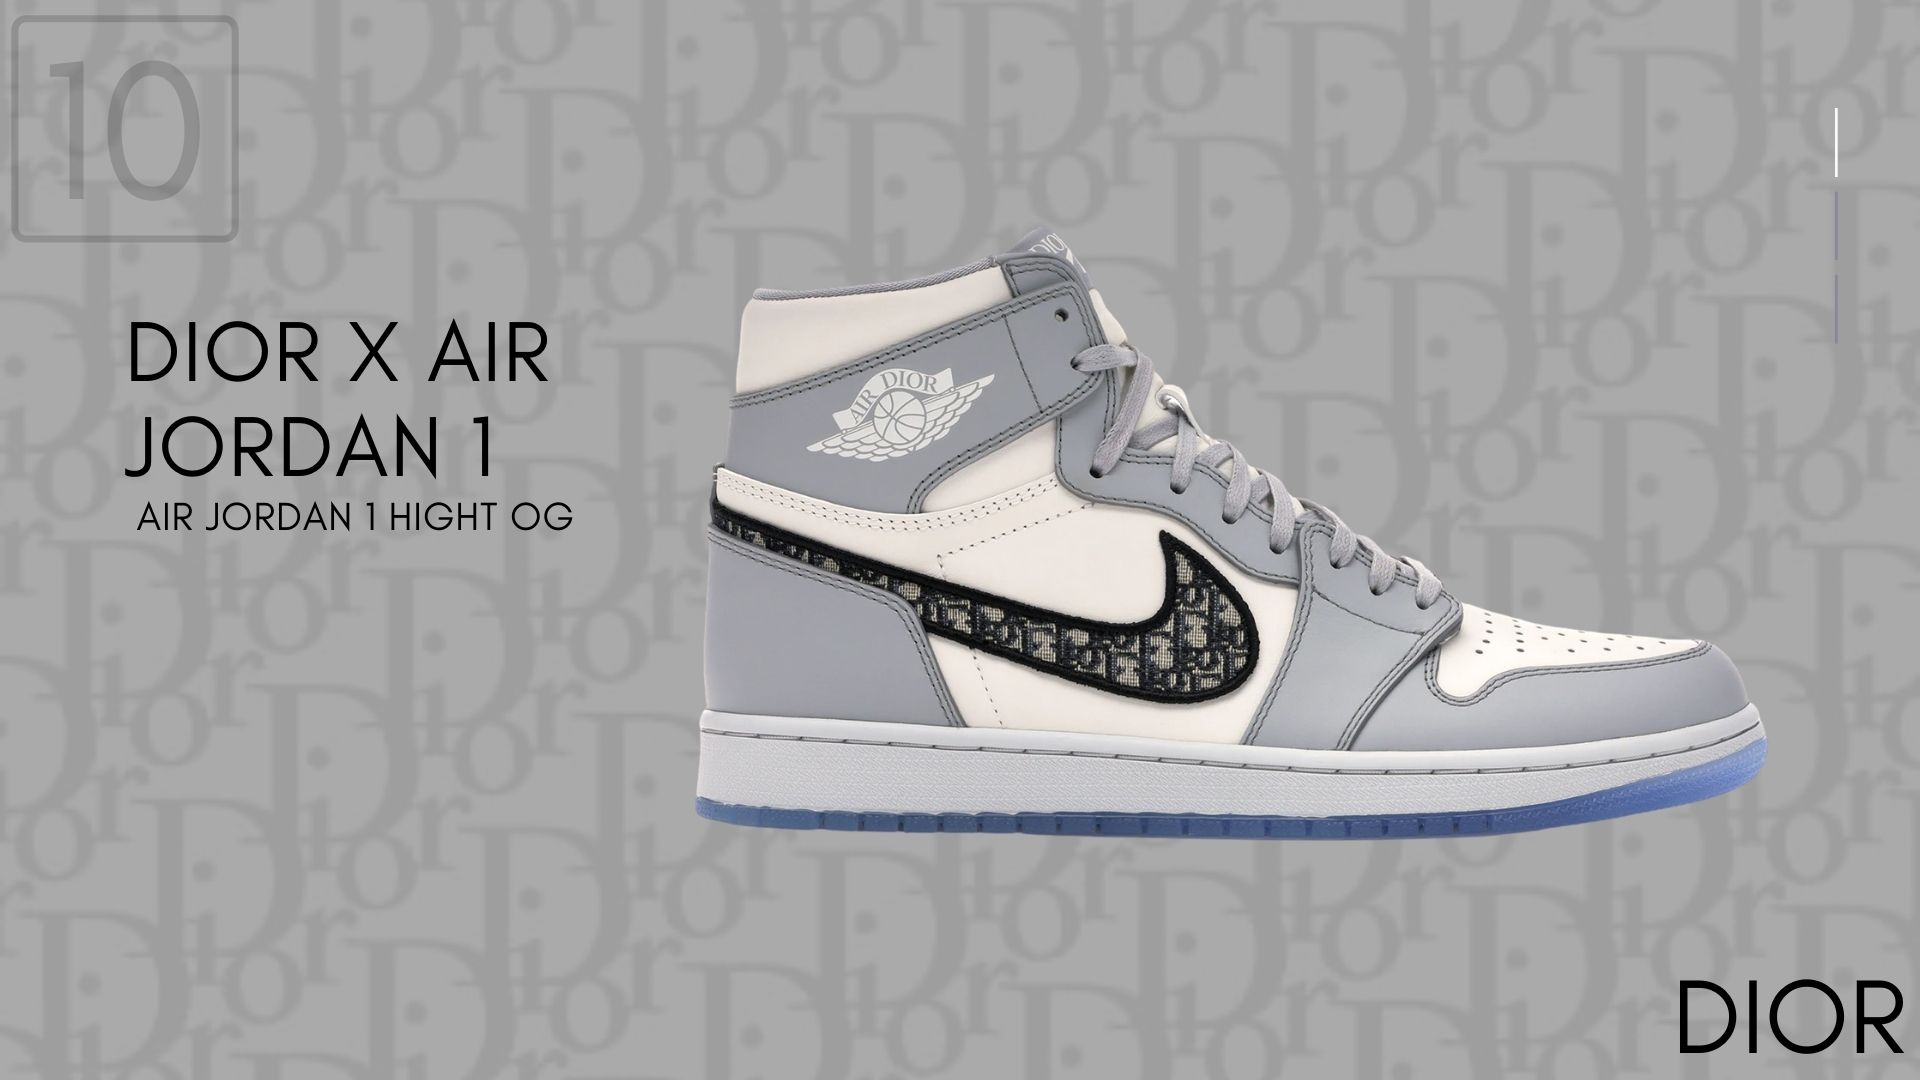 Dior X Air jordan 1 Air Jordan 1 Hight OG